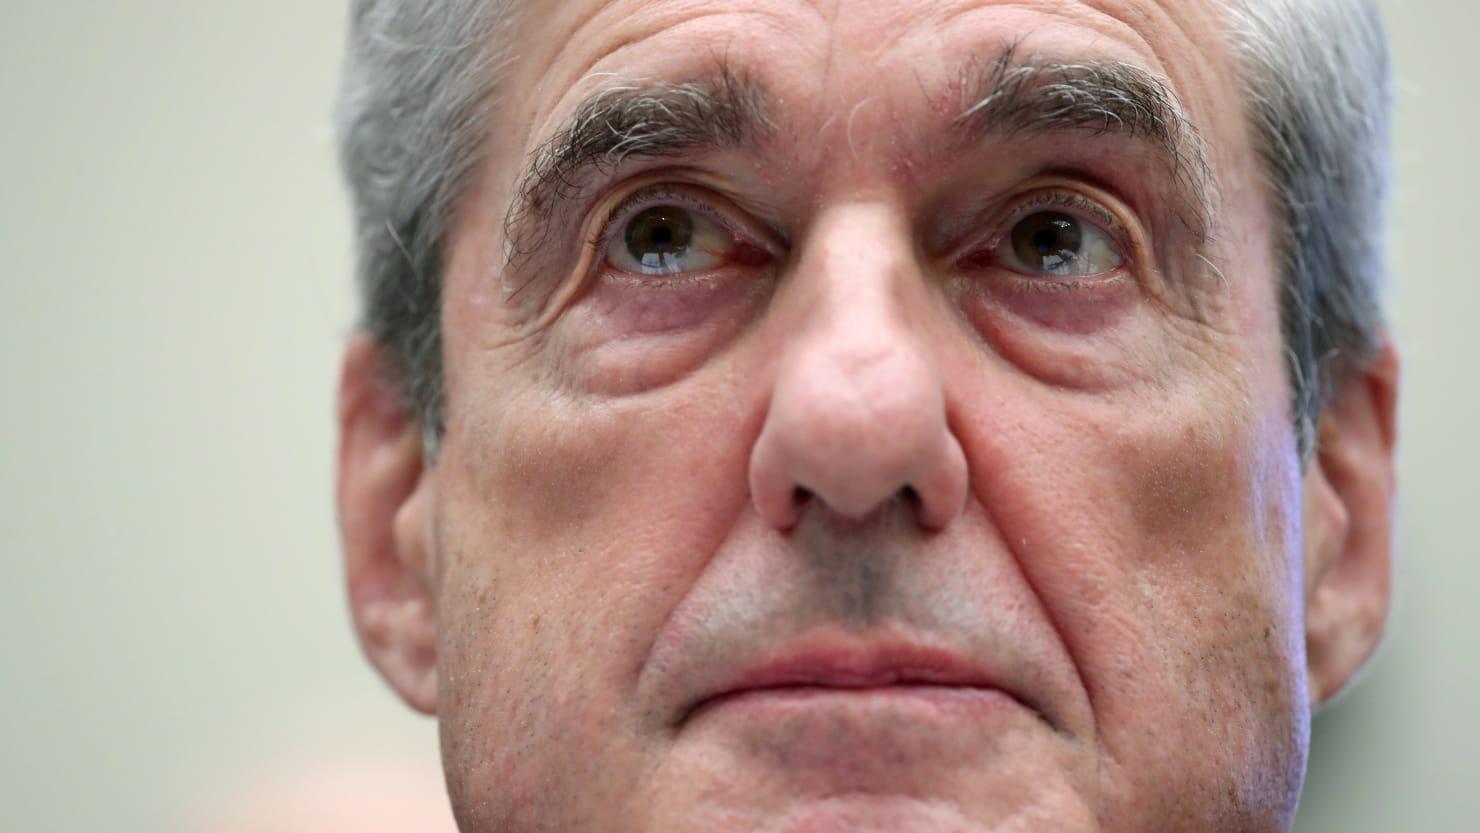 thedailybeast.com - Blake Montgomery - Robert Mueller Denounces Trump's Roger Stone Rescue in Op-Ed